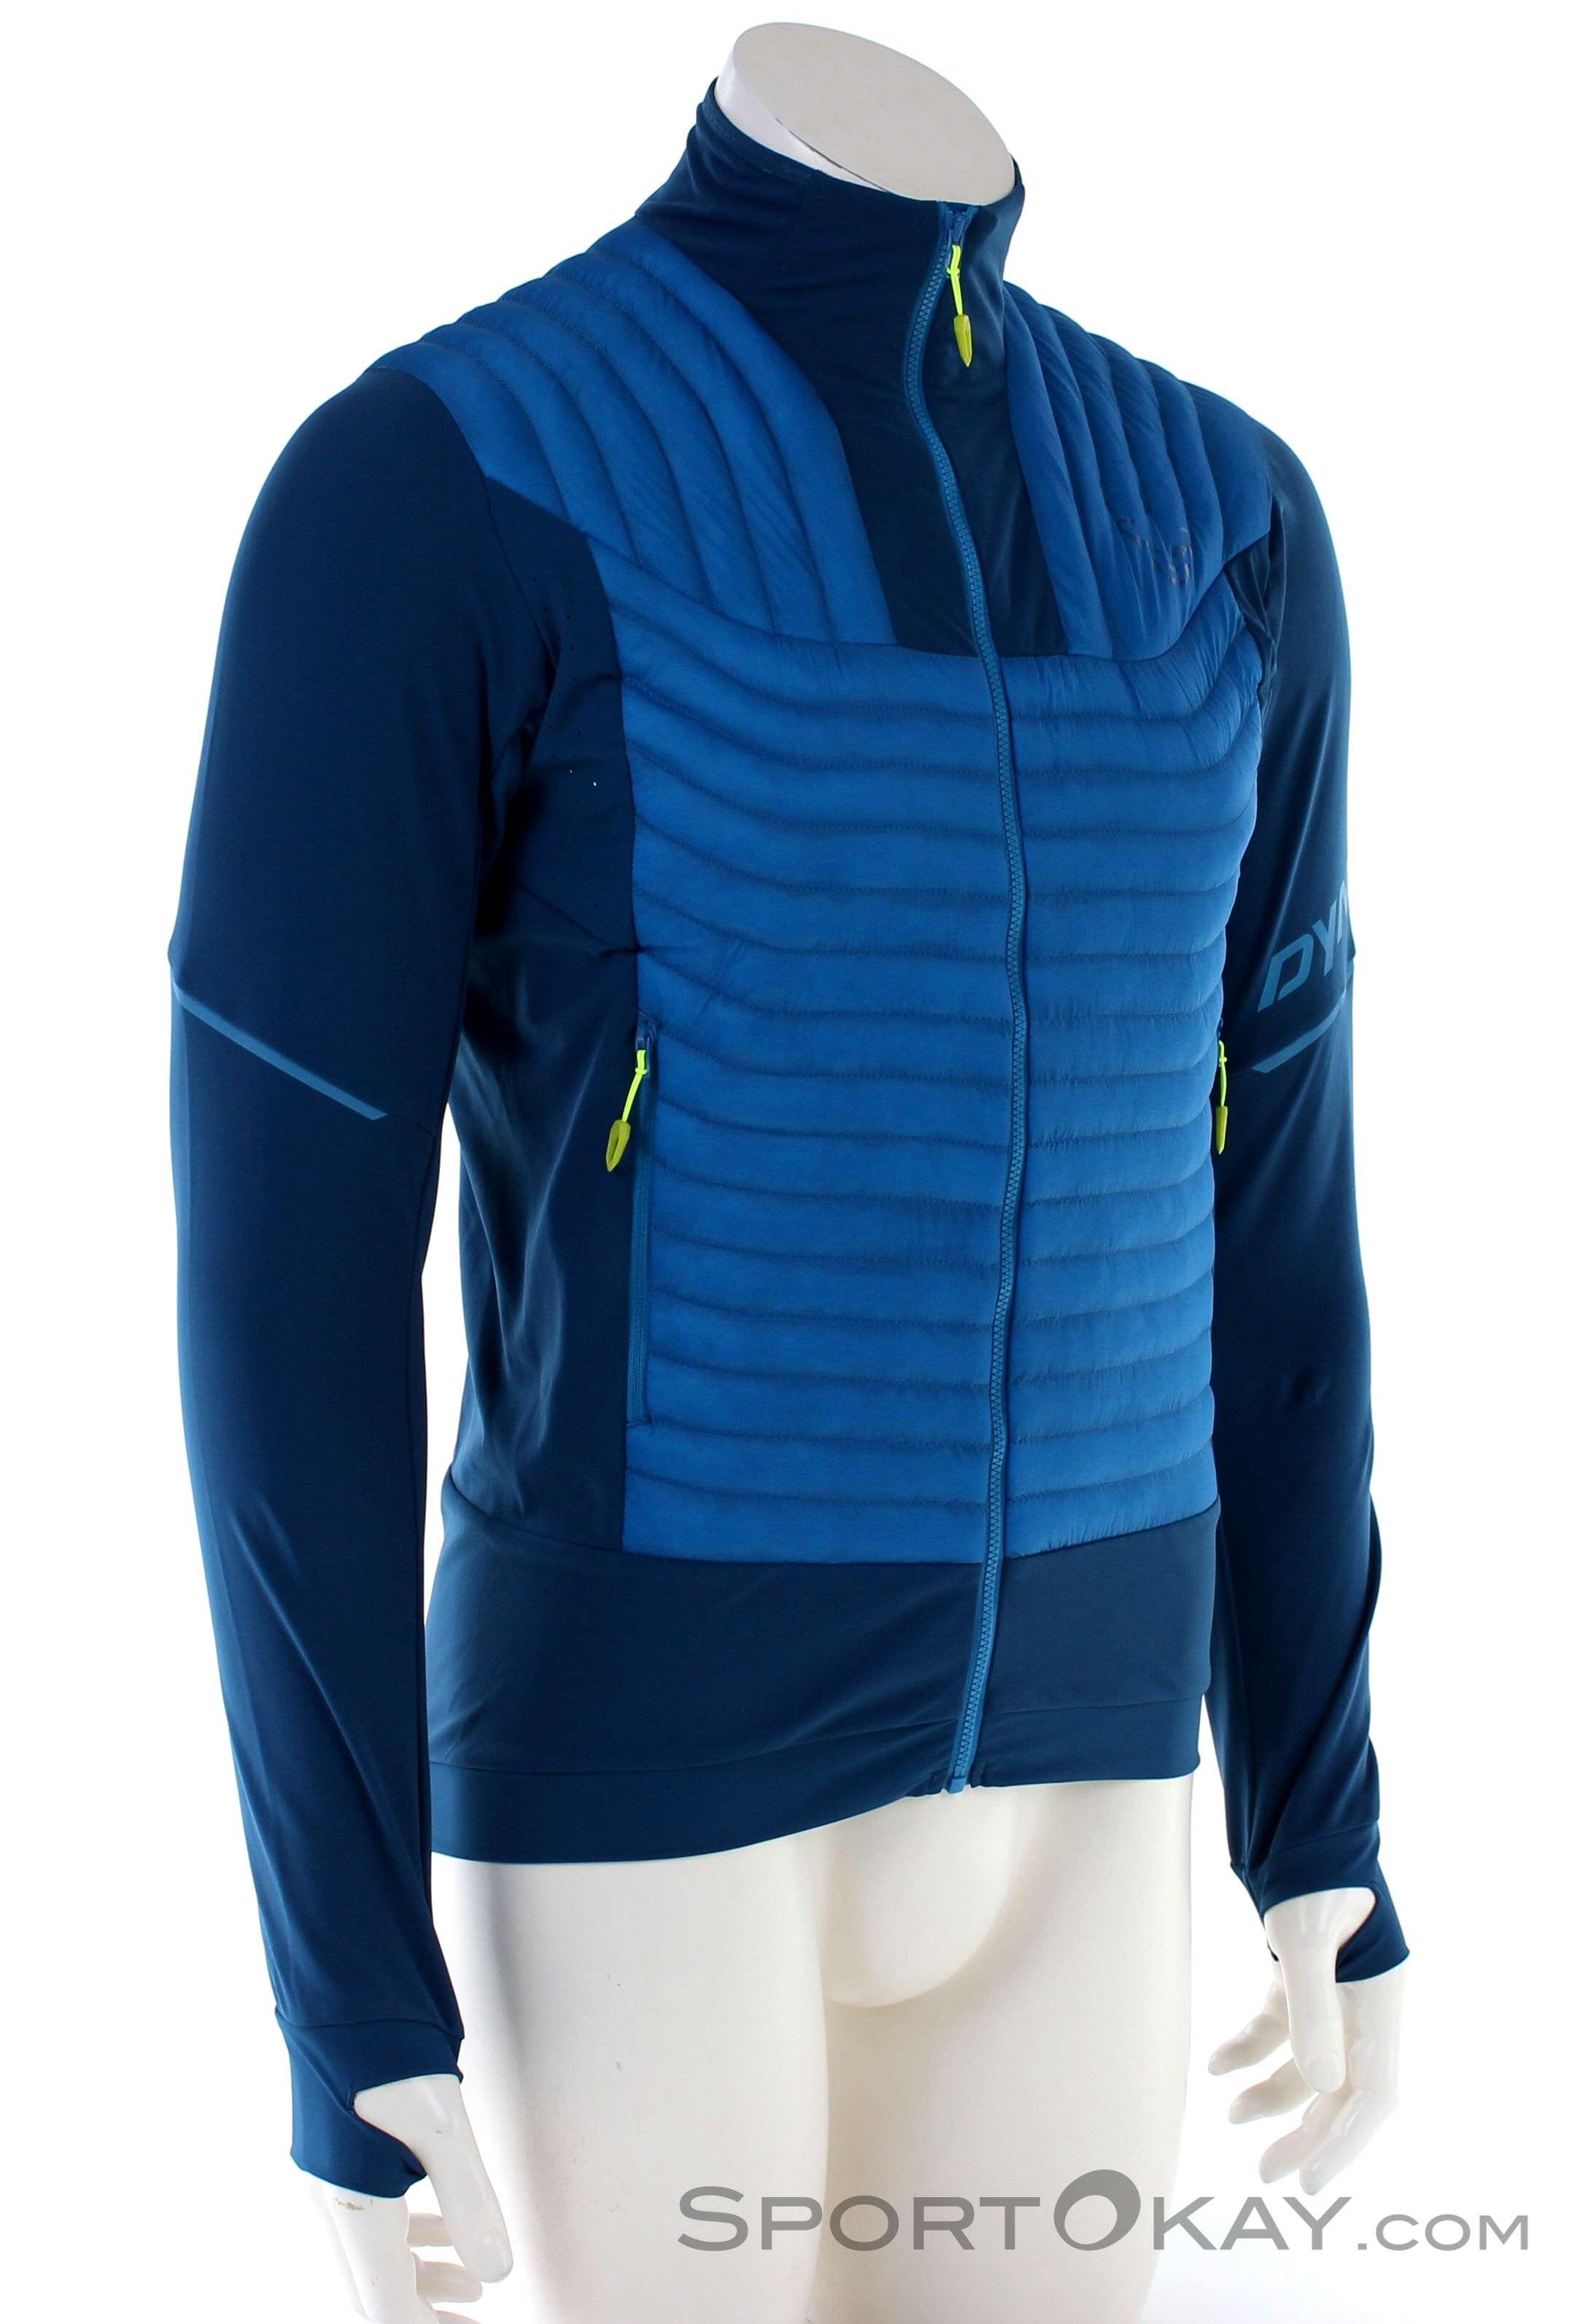 Elevation Hybrid Jacket Women